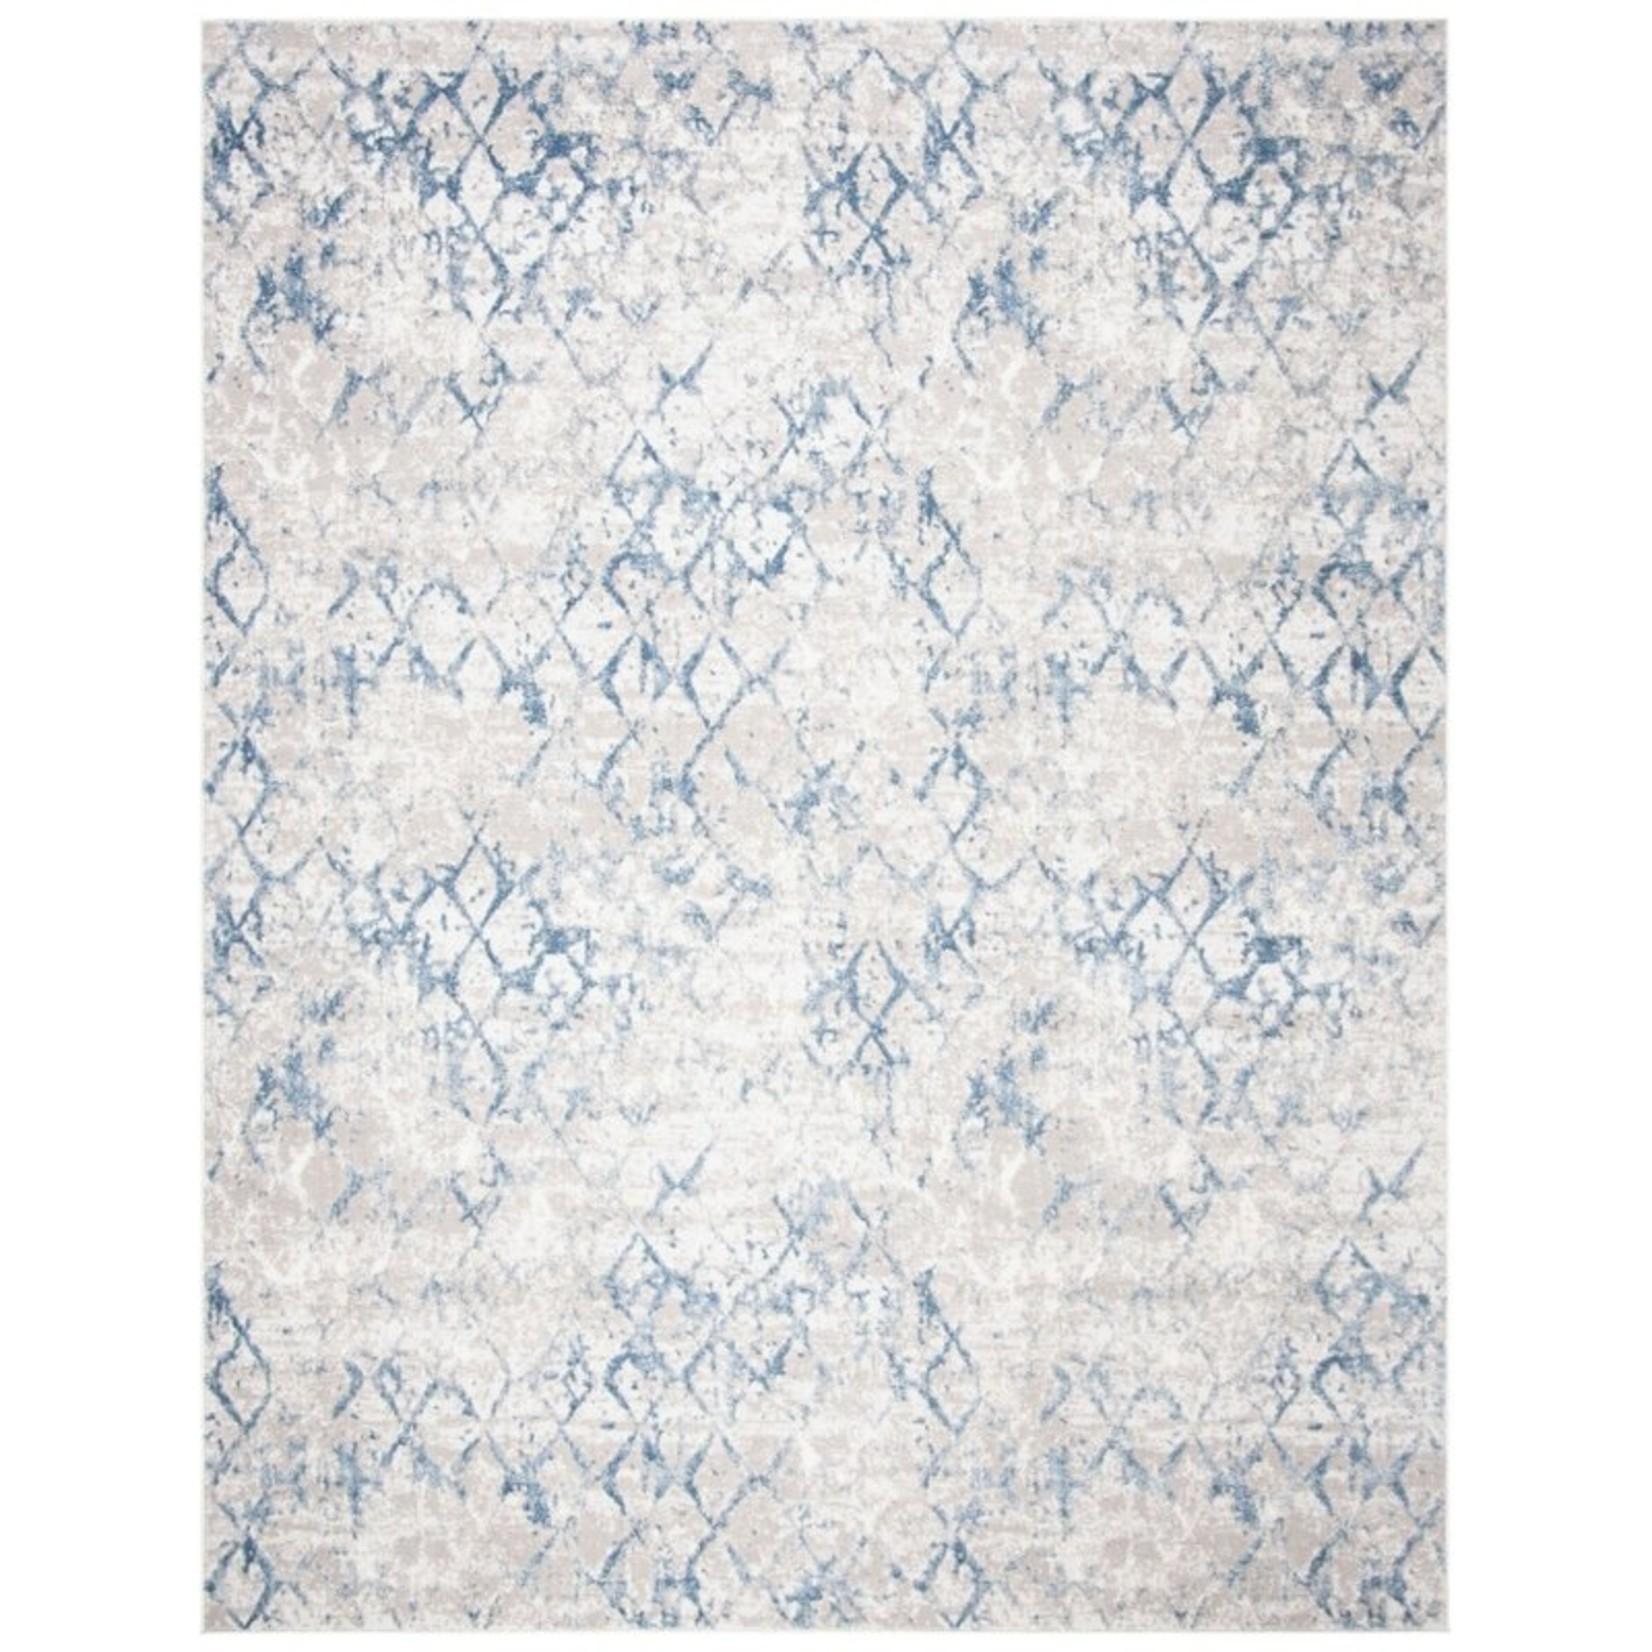 *12' x 18' - Wincott Geometric Blue Area Rug